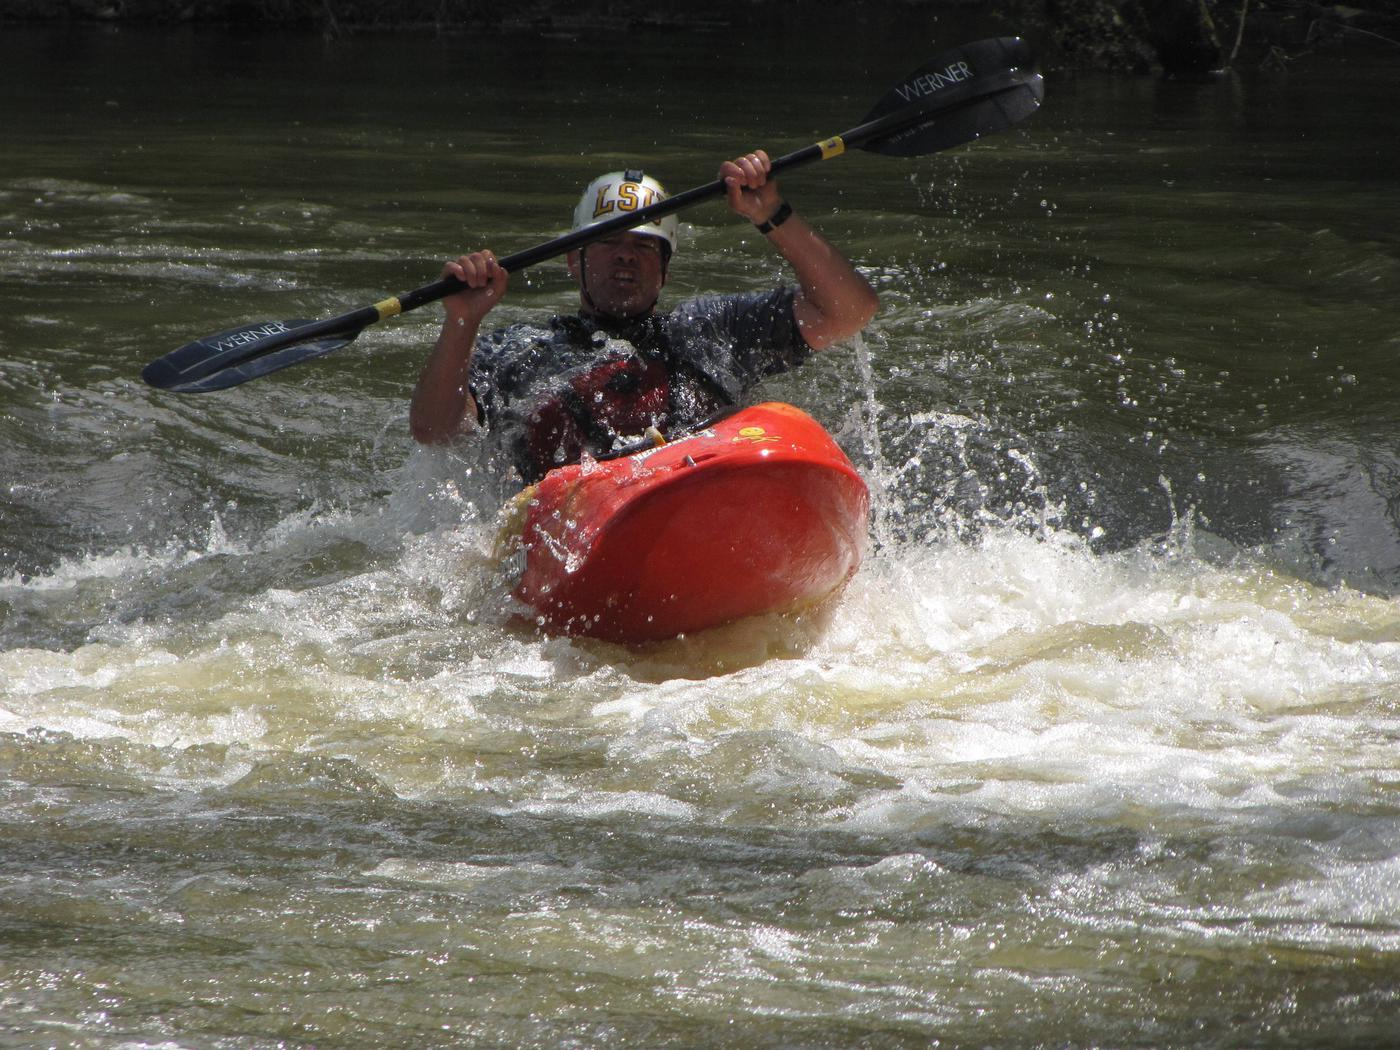 Kayaker at Horseshoe Bend